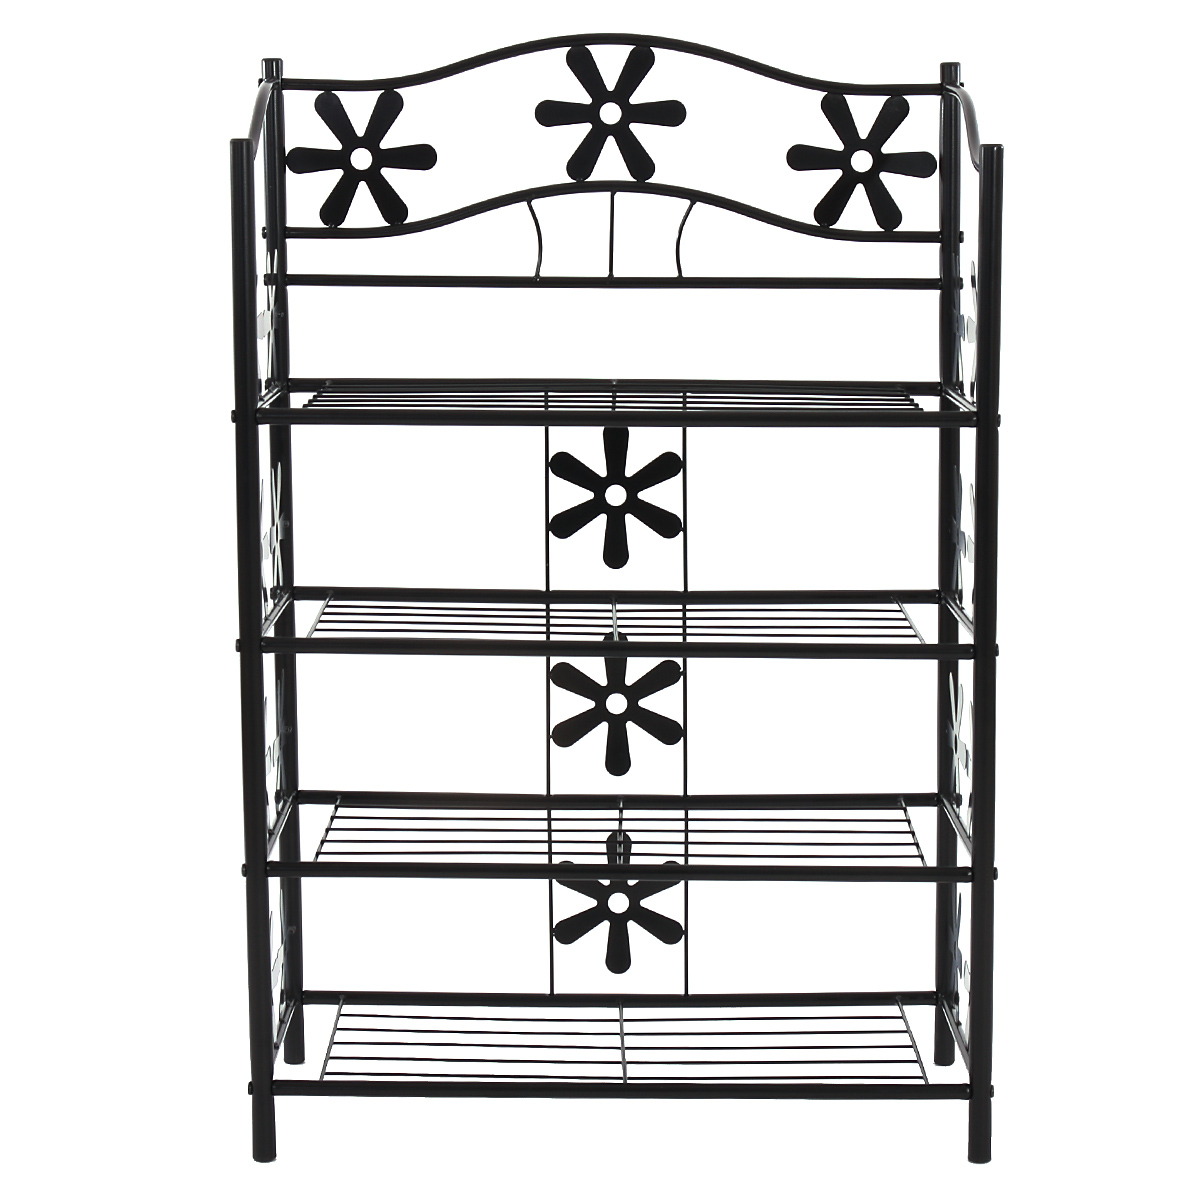 bcherregal 90 cm breit cheap awesome schrank cm tief. Black Bedroom Furniture Sets. Home Design Ideas